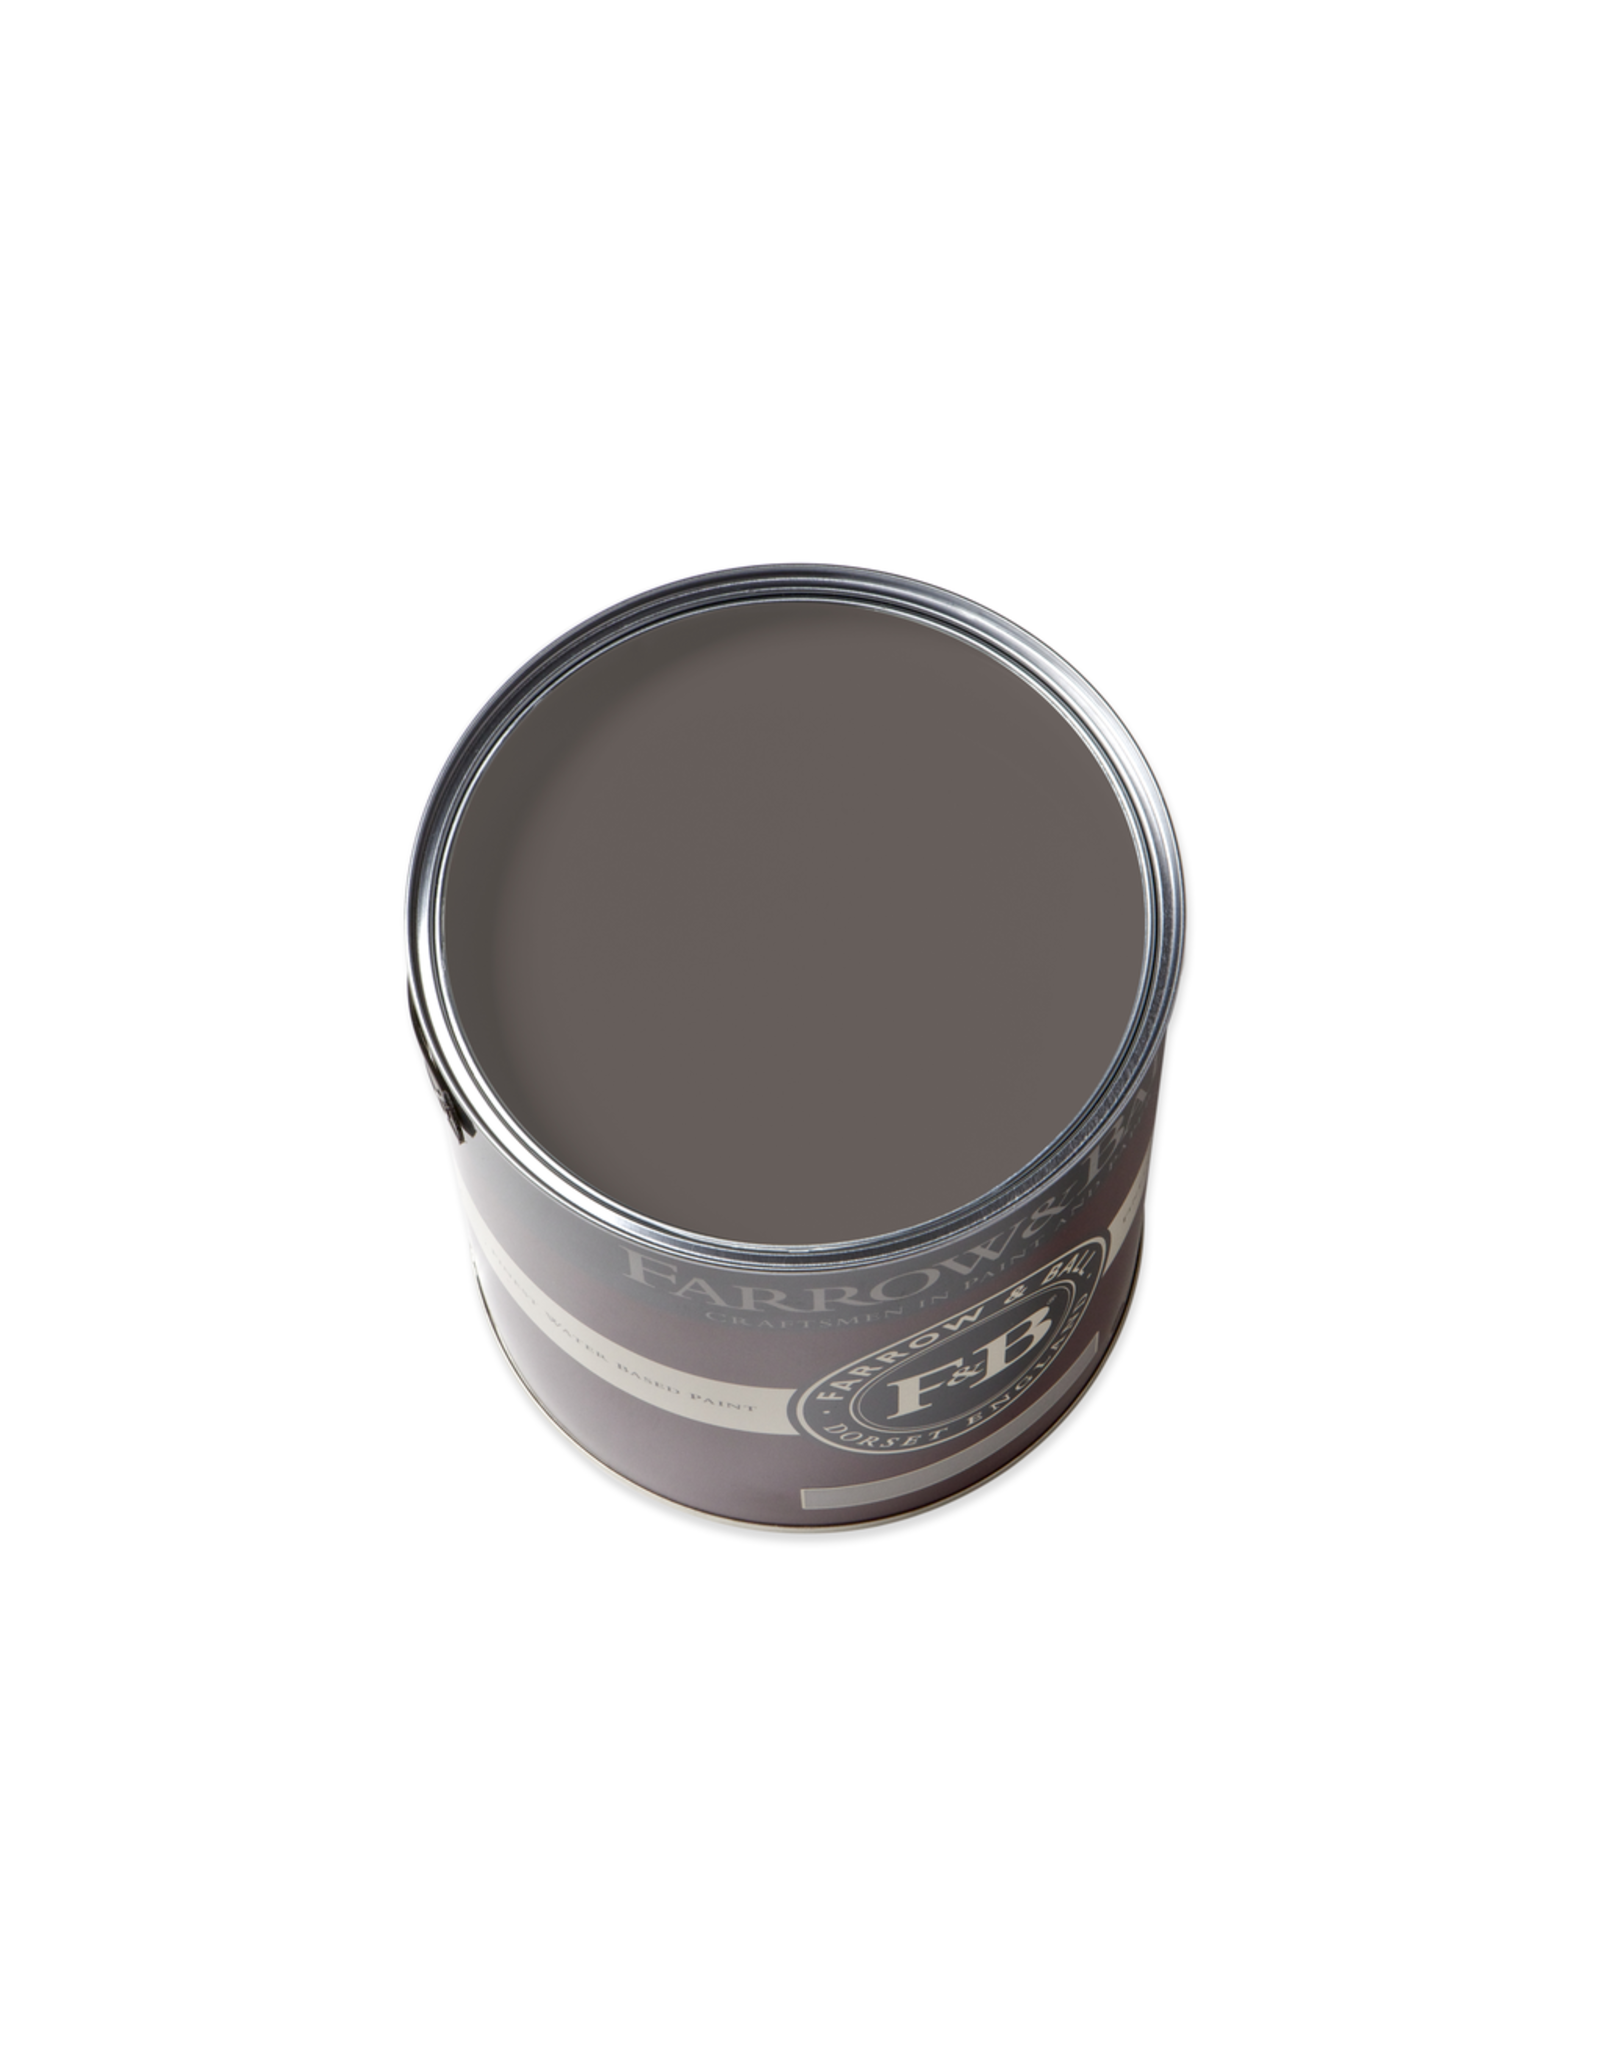 Farrow and Ball Gallon Modern Emulsion London Clay No. 244